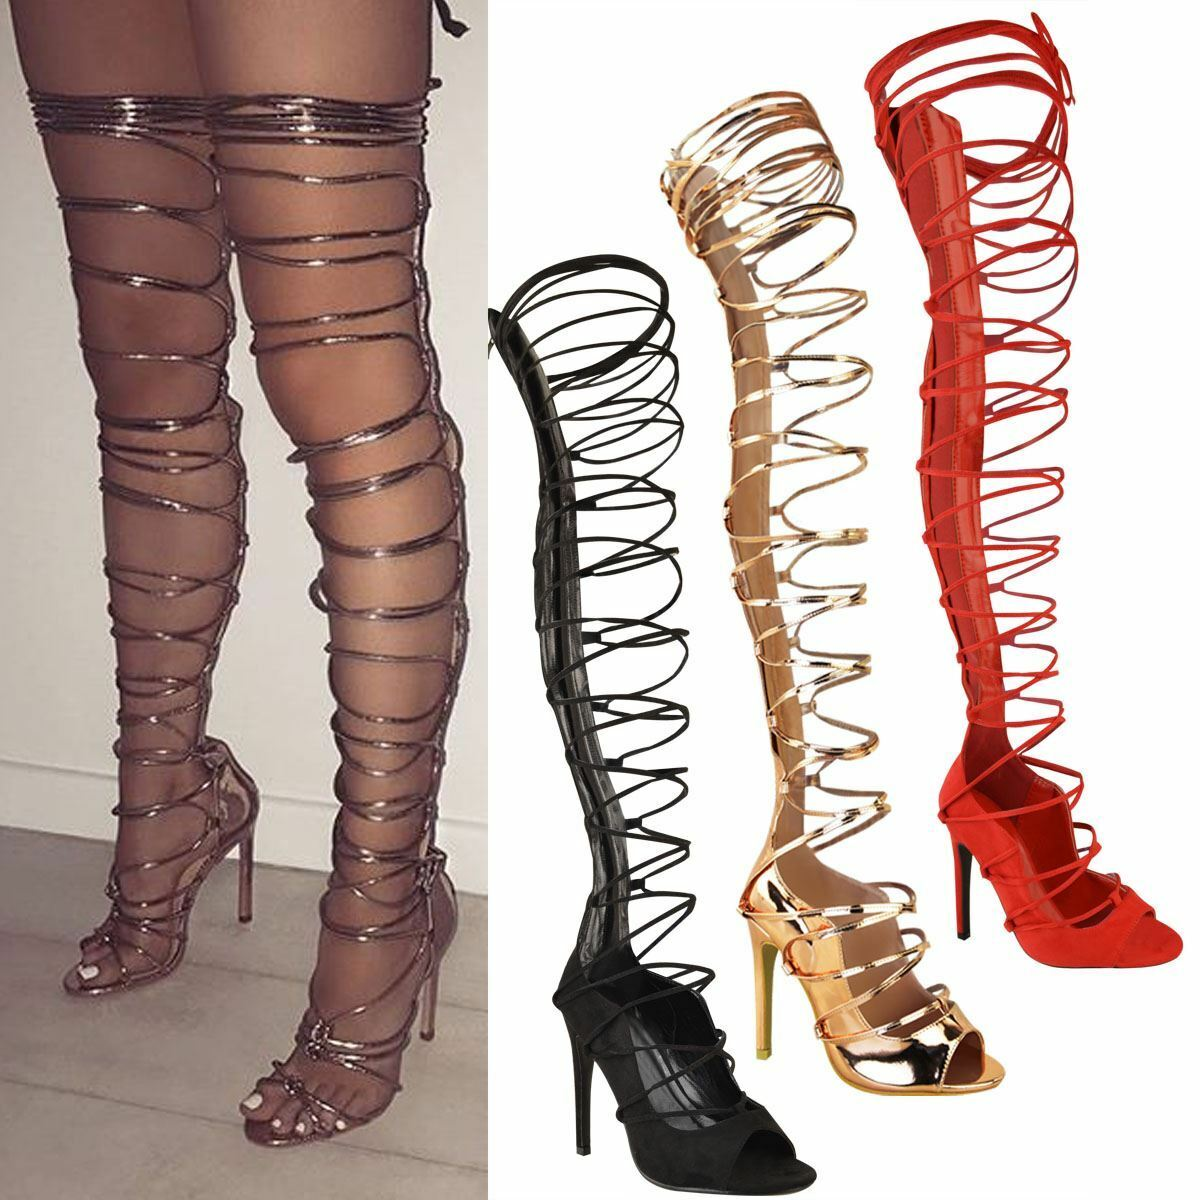 Mujer botas Over Knee Thigh High High Party Stiletto High Thigh Heel Platform Zapatos Talla 2f4dac